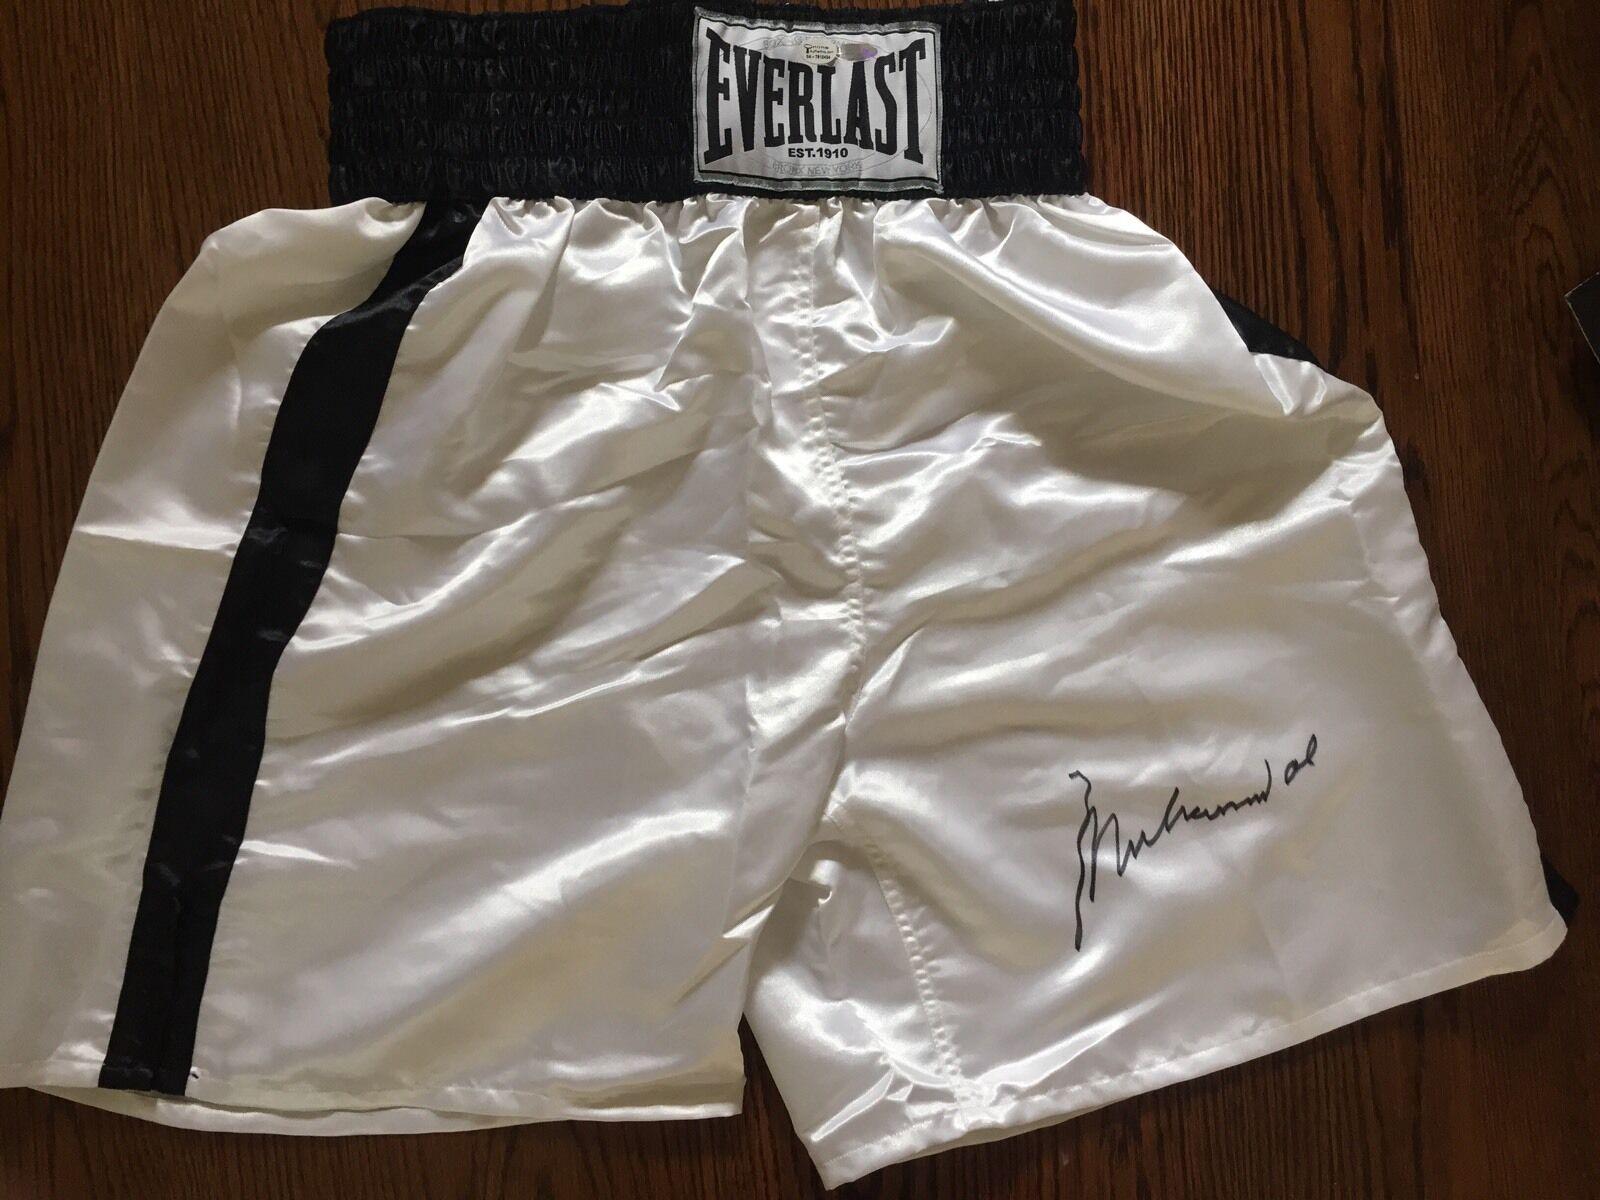 Muhammad Ali Everlast Boxing Trunks shorts mint Autograph Steiner Online Coa